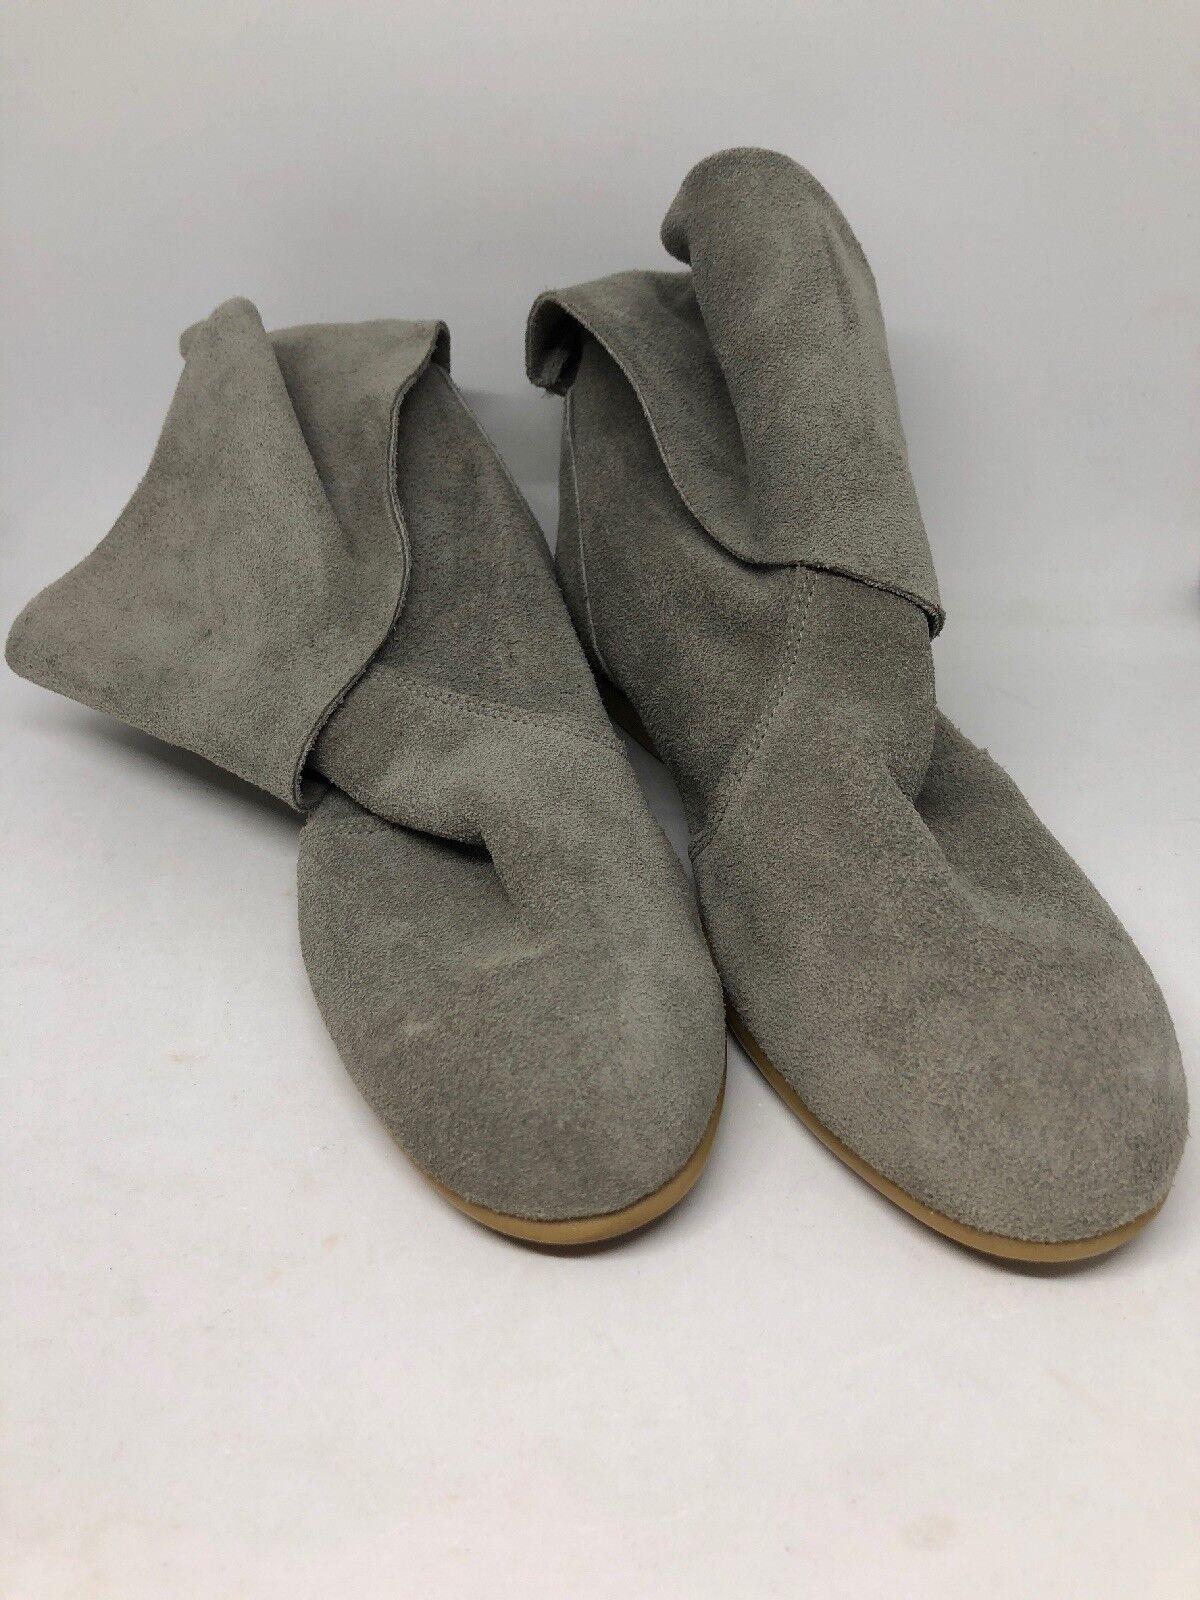 Vtg 80s grau Suede damen sz 6 B Unbranded Flat Heel Ankle Stiefel EUC -USA-